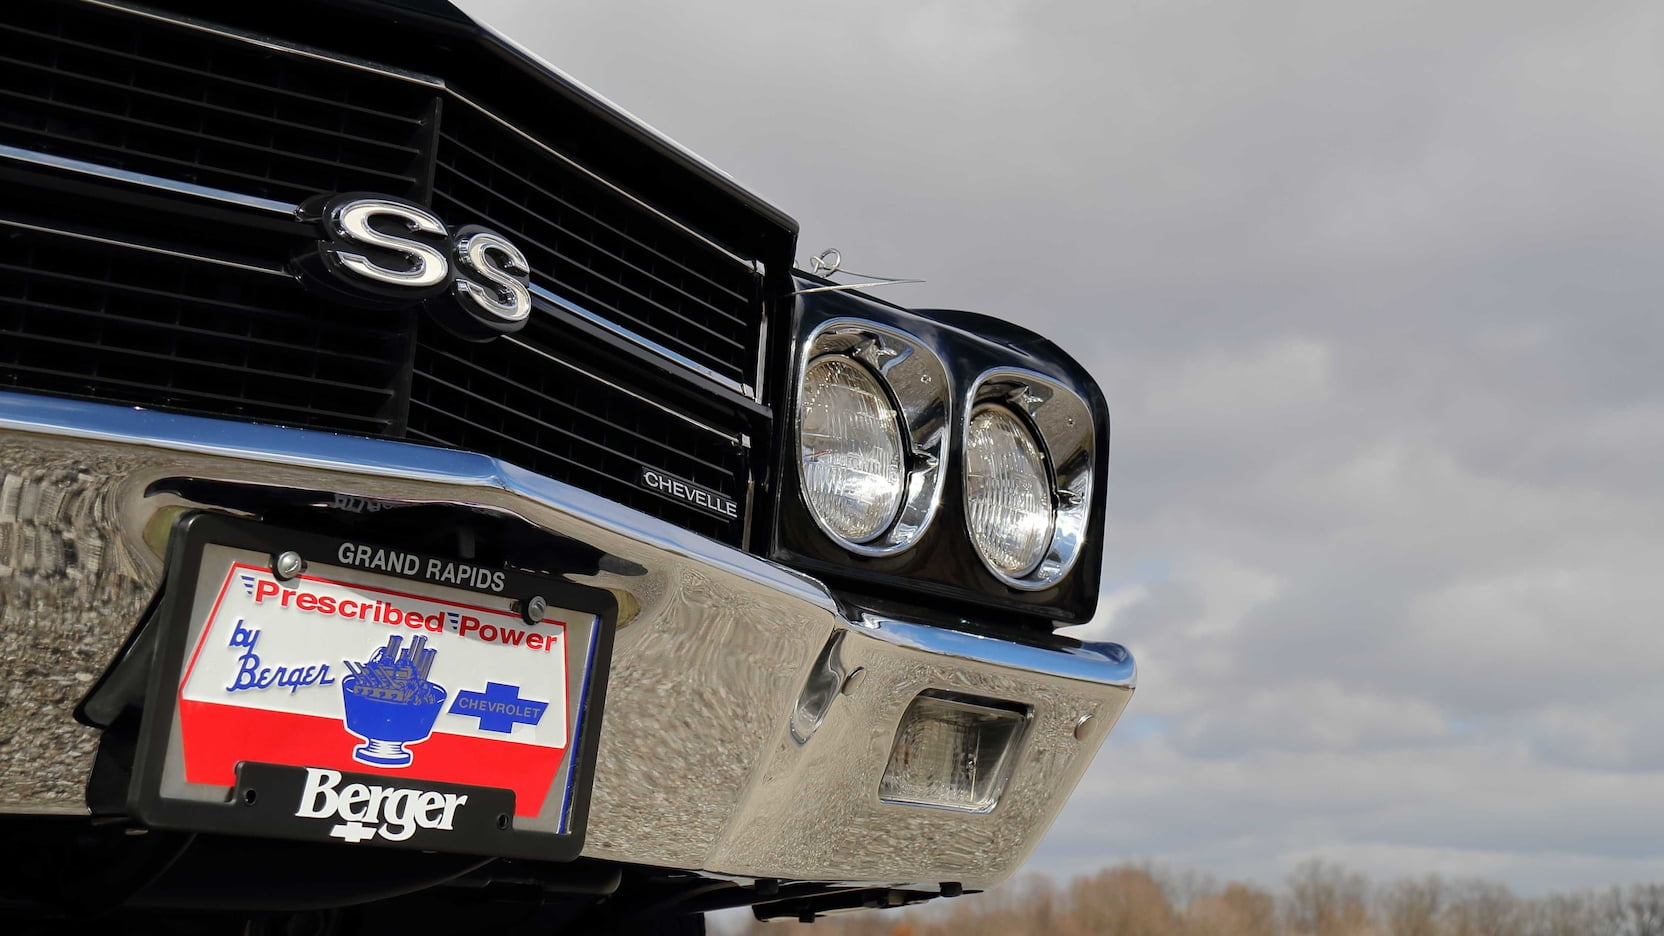 1970 Chevrolet Chevelle LS6 Convertible Front Grille Detail